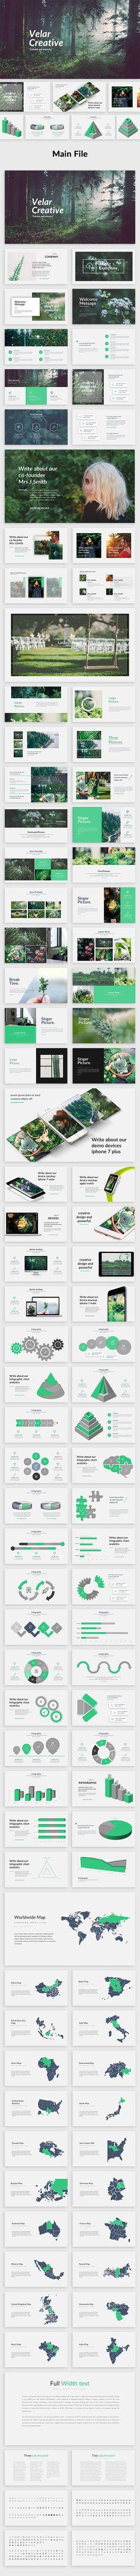 Velar - Creative #Powerpoint Template - #Creative PowerPoint Templates Download here: https://graphicriver.net/item/velar-creative-powerpoint-template/19616813?ref=alena994